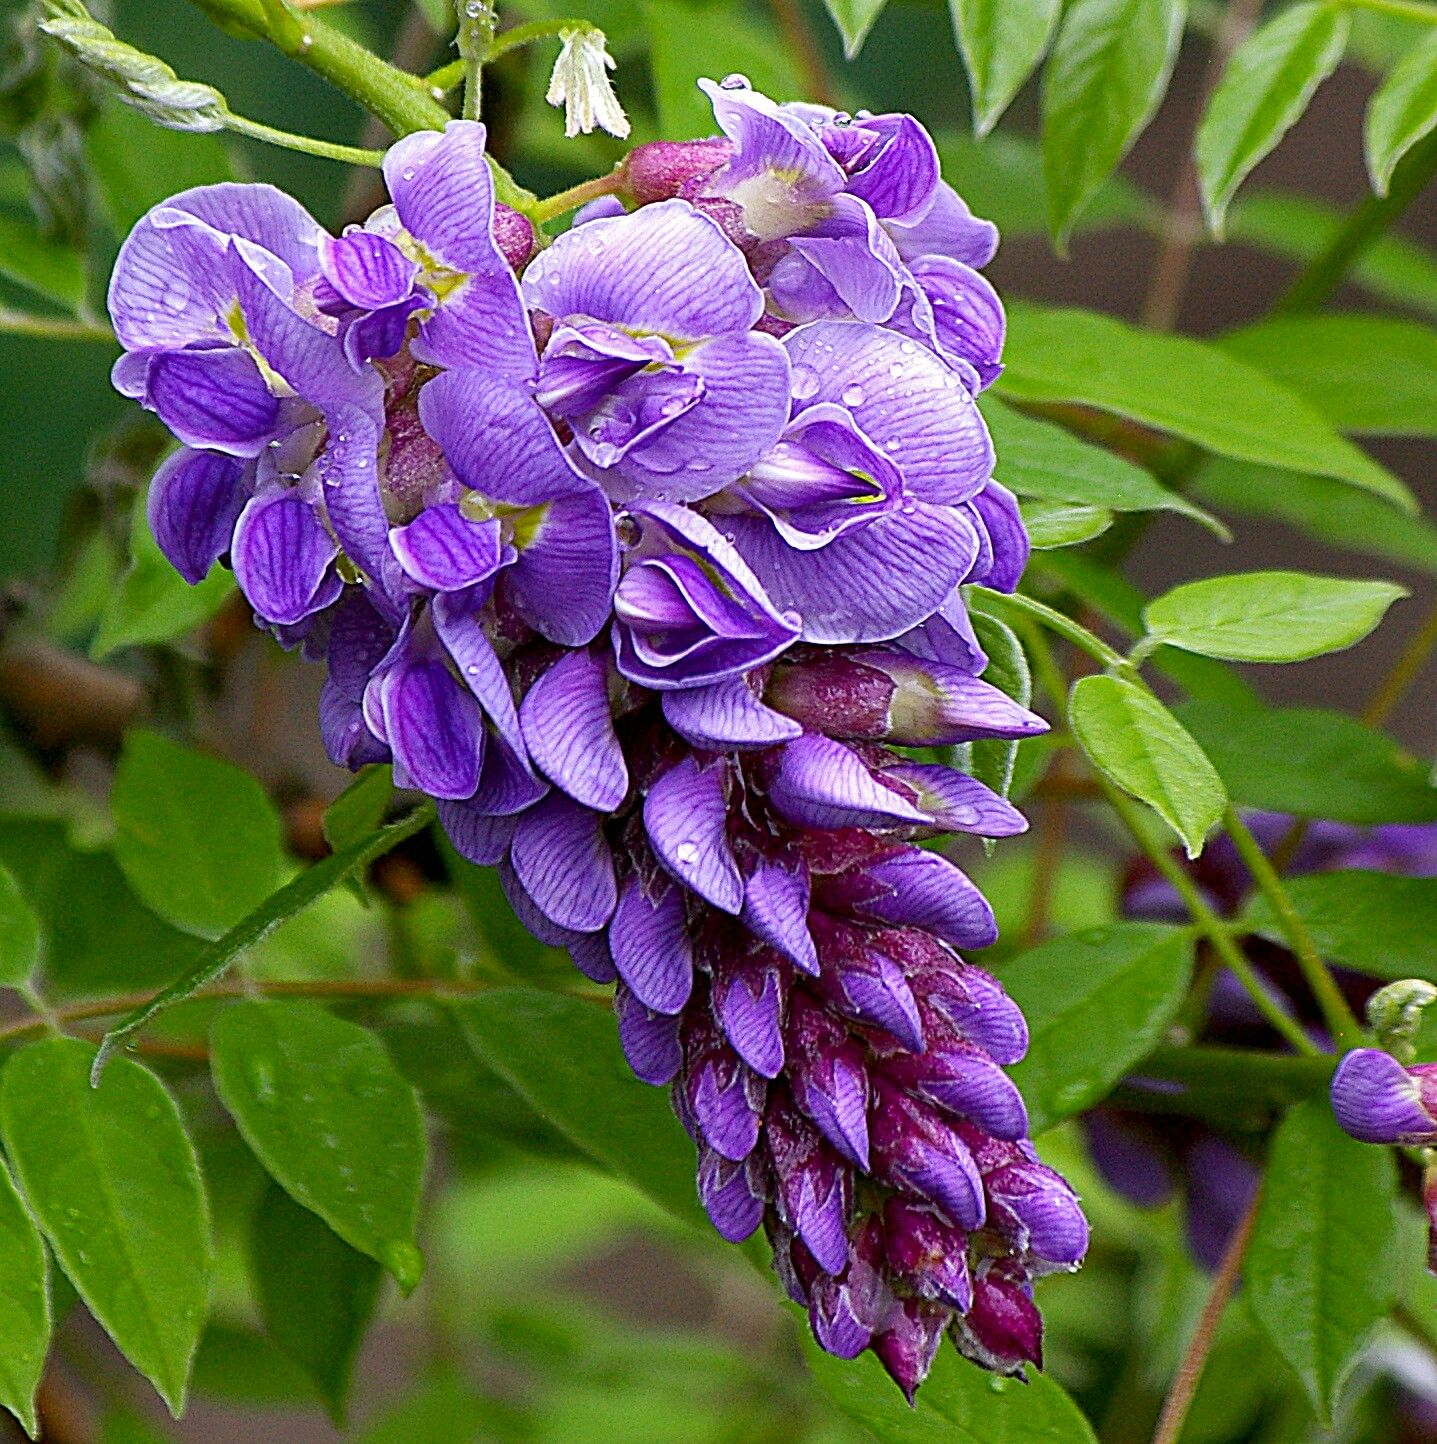 Pin By Rattana Chaichana On ดอกไม Purple Flowers Wisteria Amethyst Falls Planting Flowers